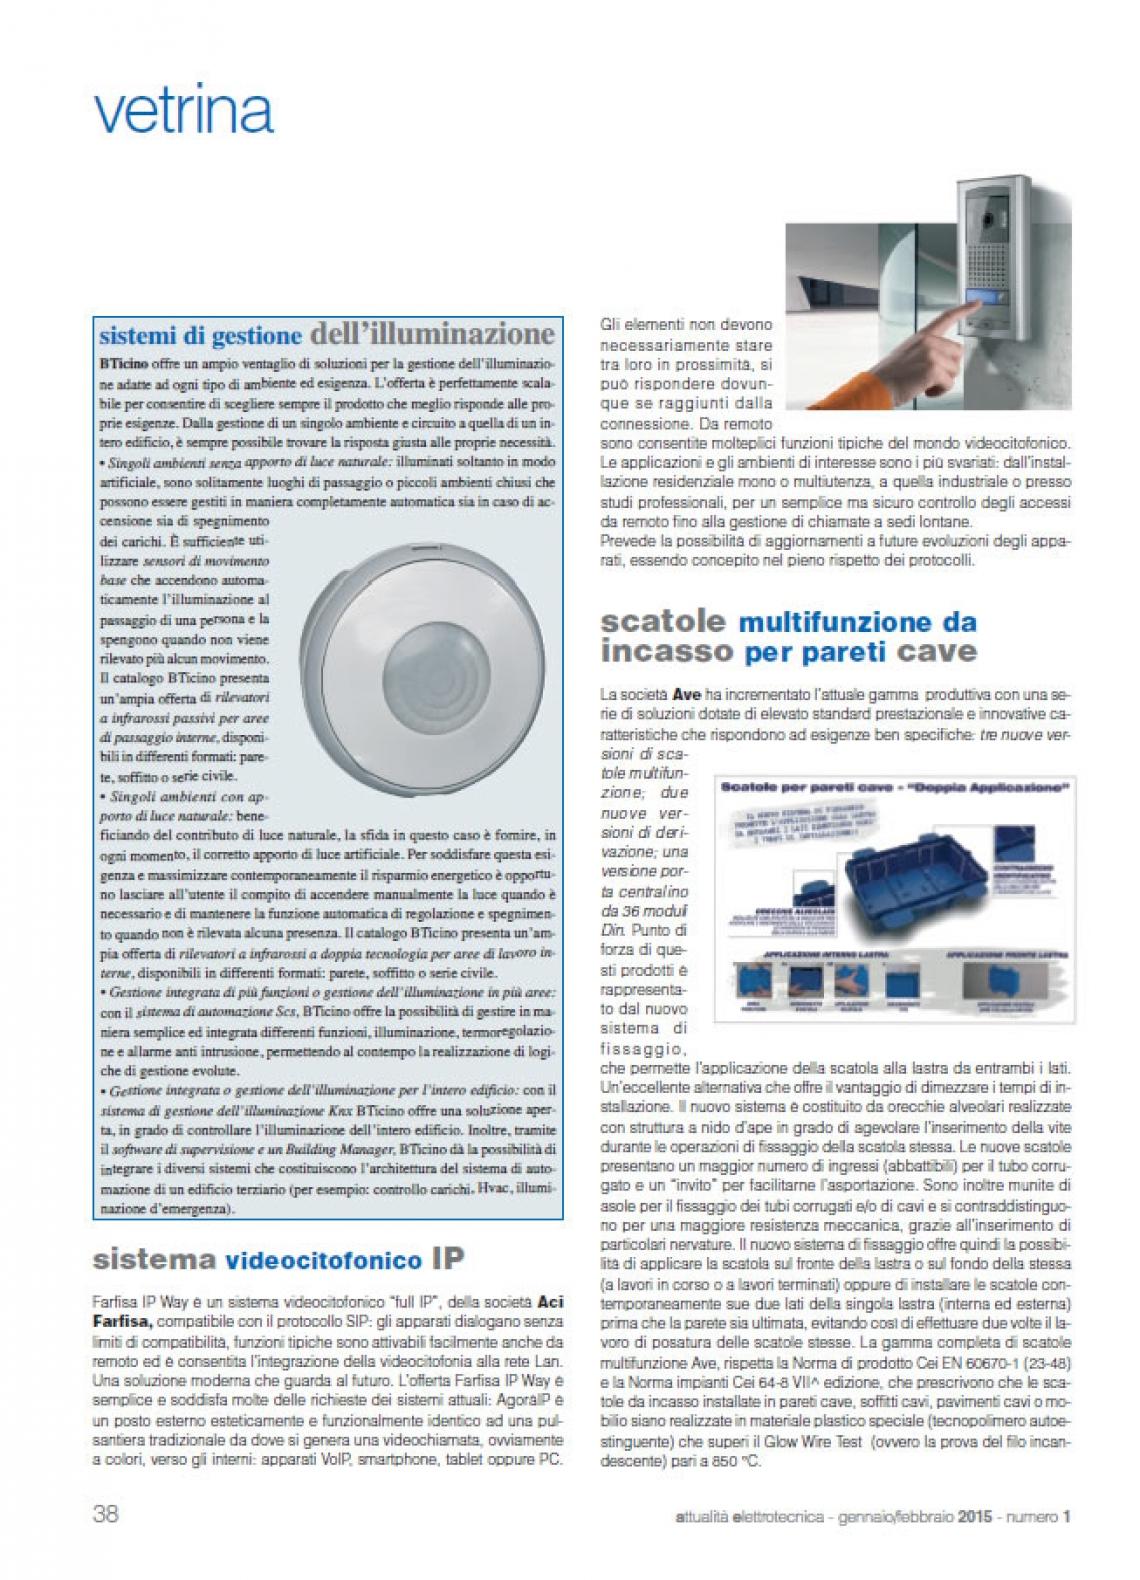 Sistema videocitofonico IP